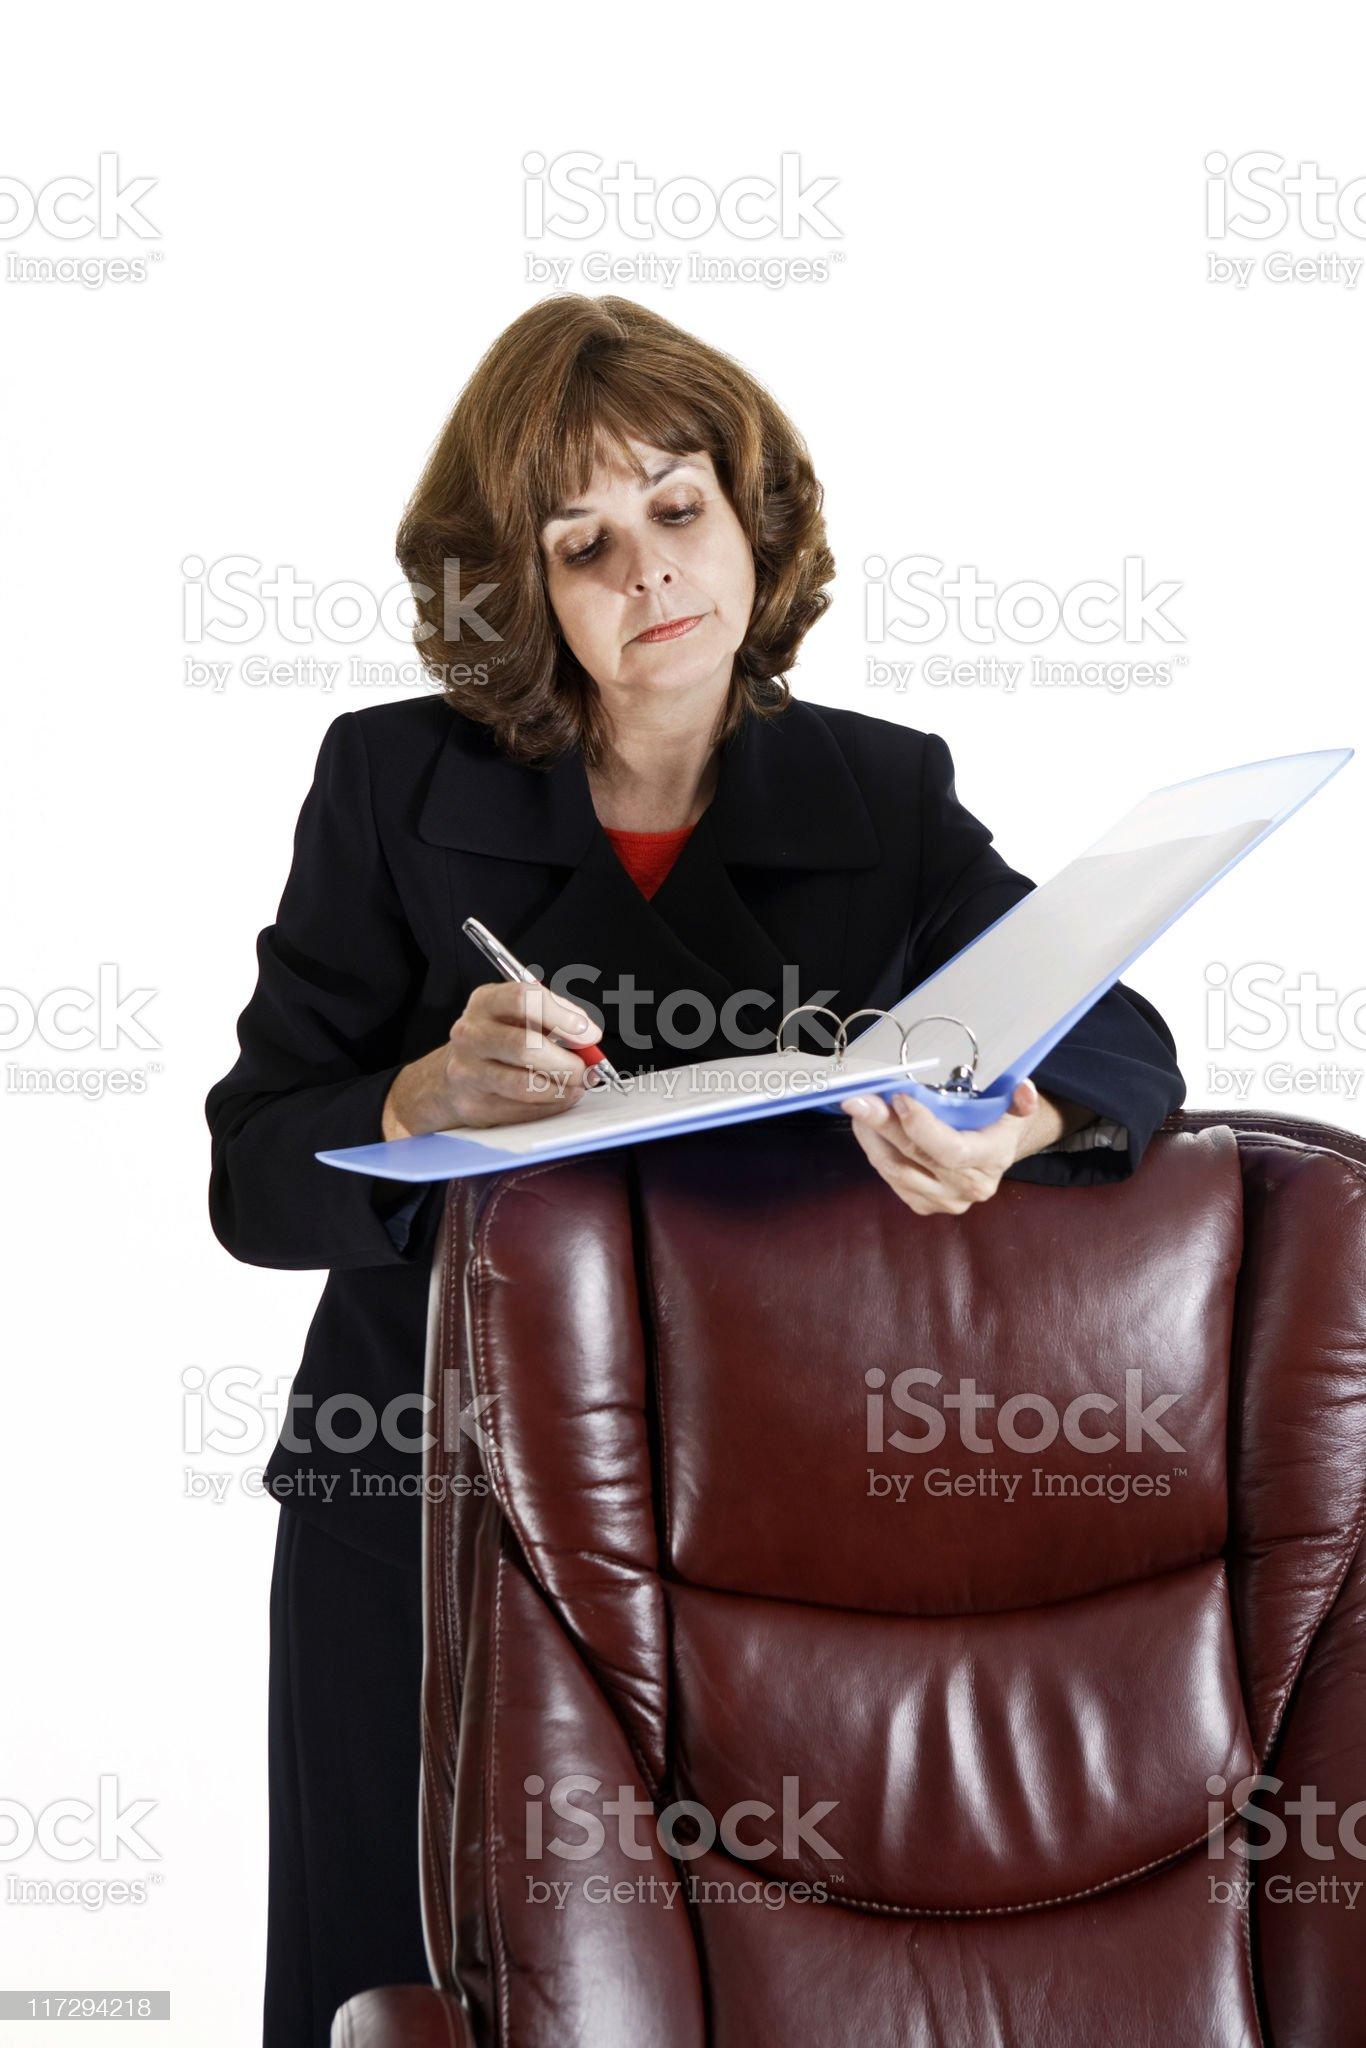 Making Notes royalty-free stock photo